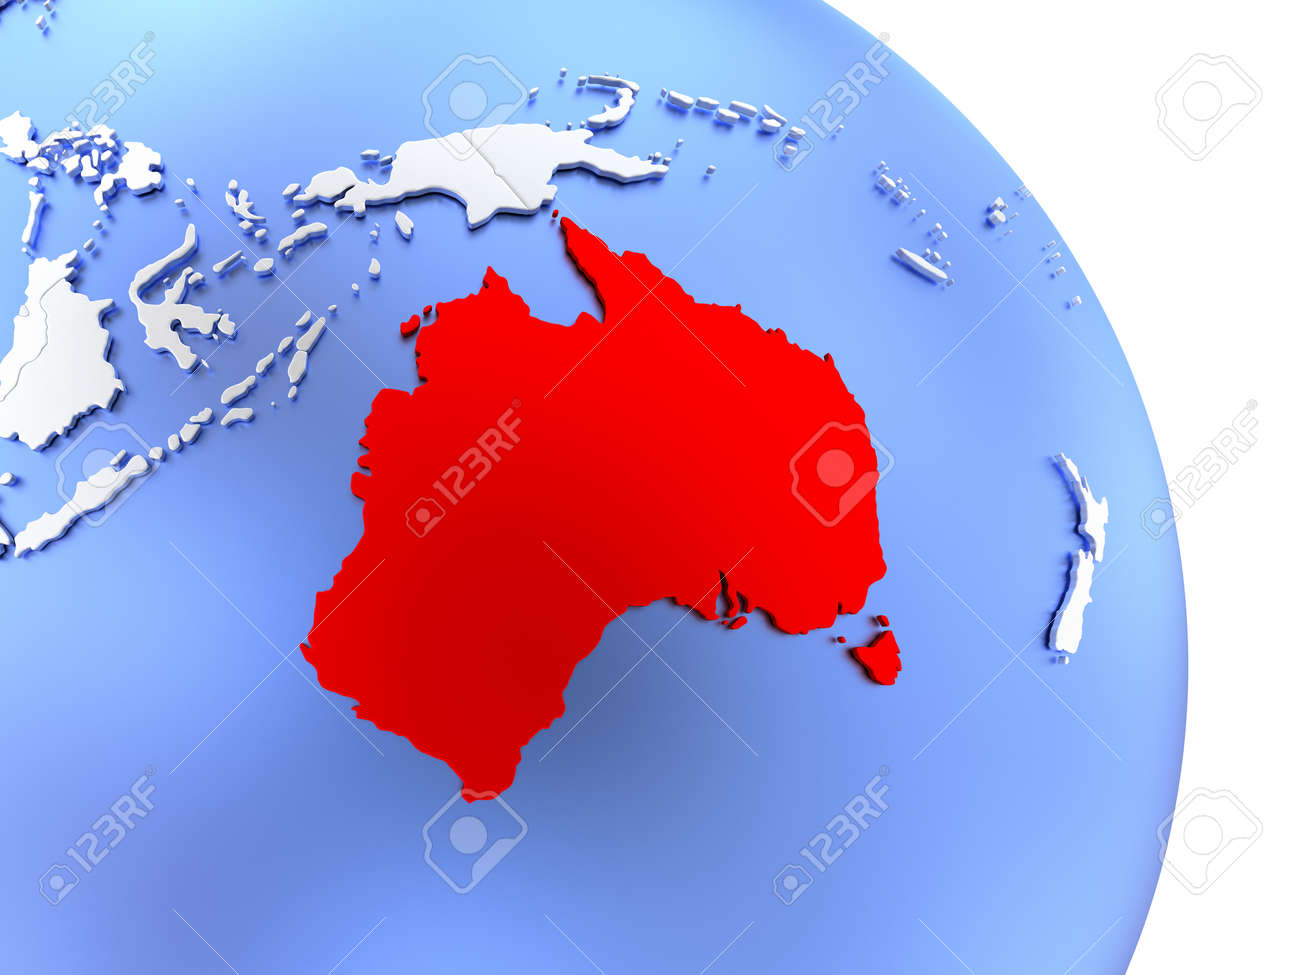 illustration map of australia on elegant shiny globe 3d illustration